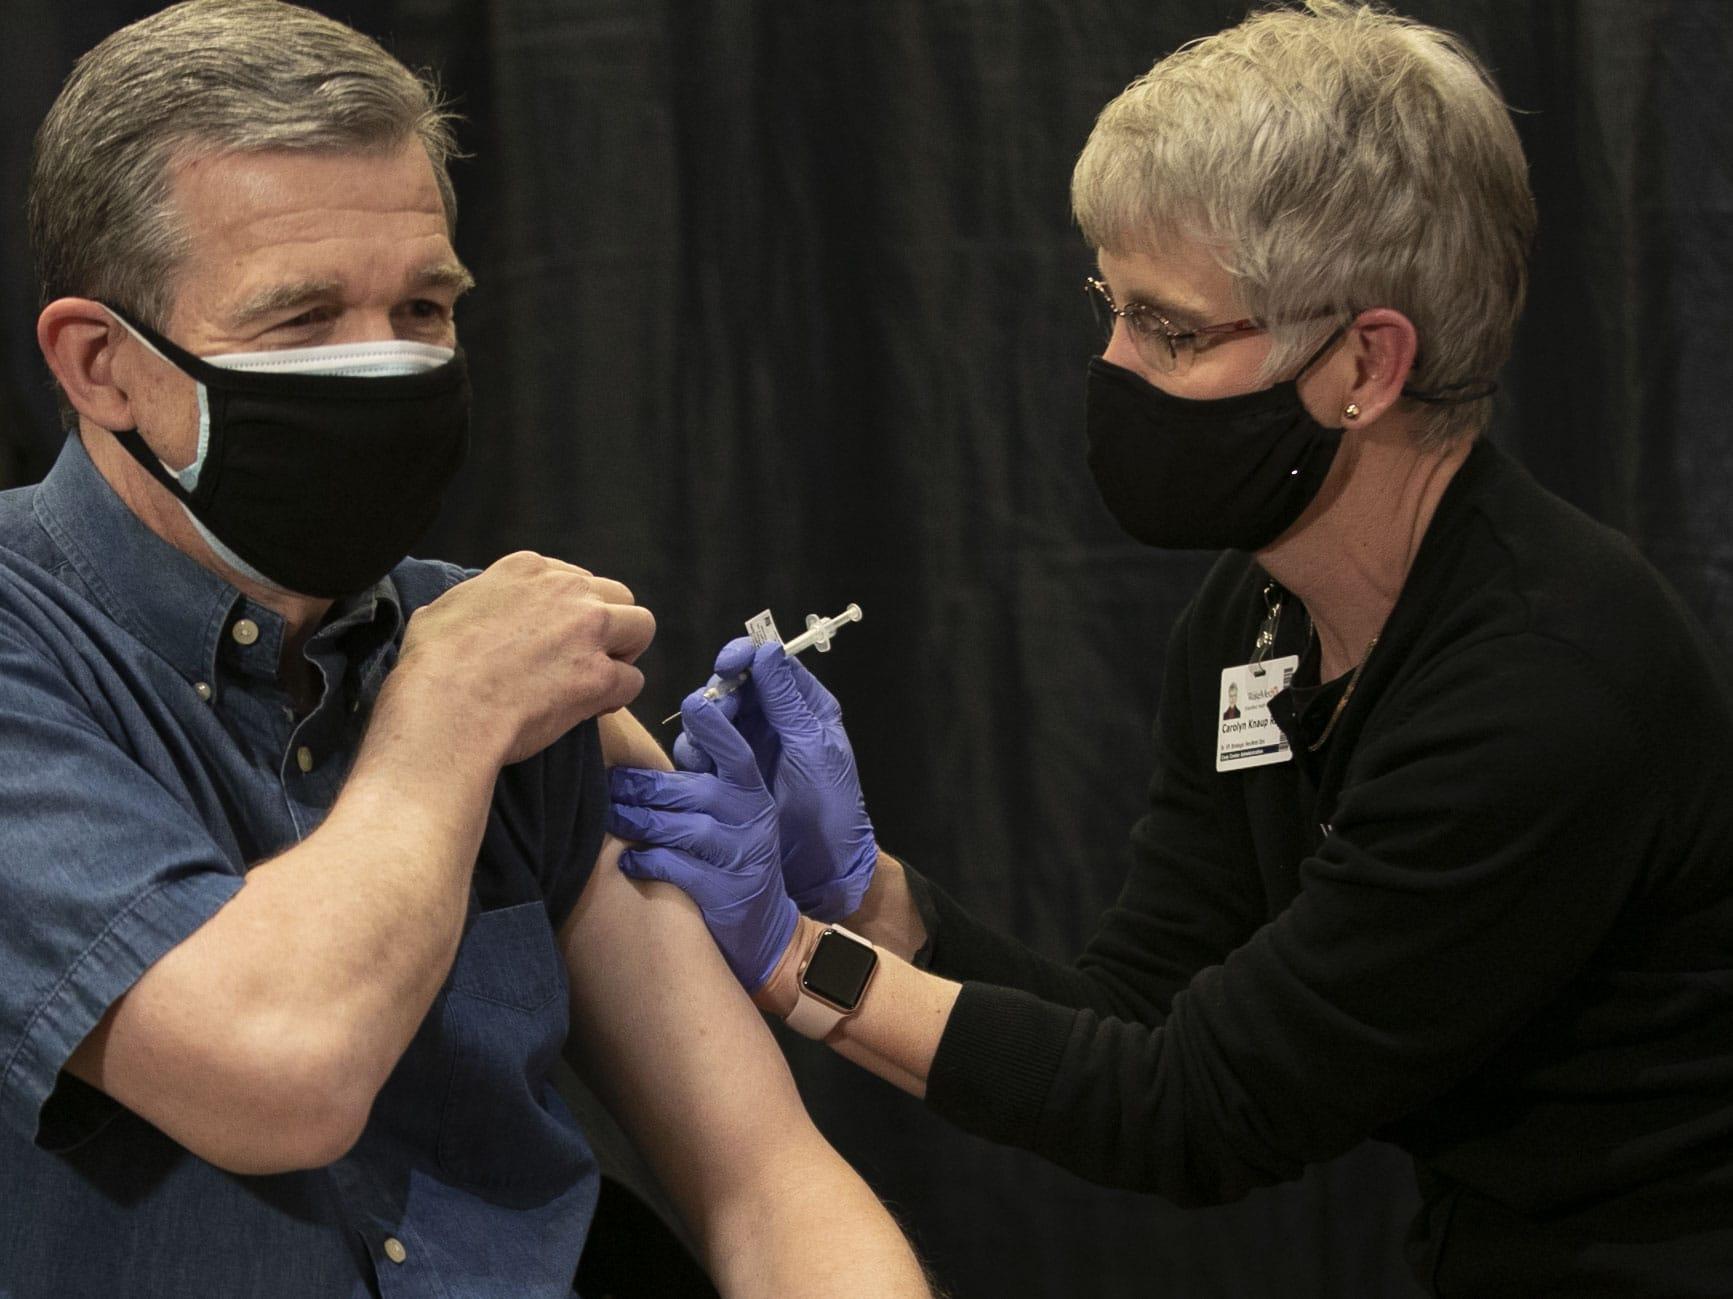 Governor Cooper Receives a COVID-19 Vaccine